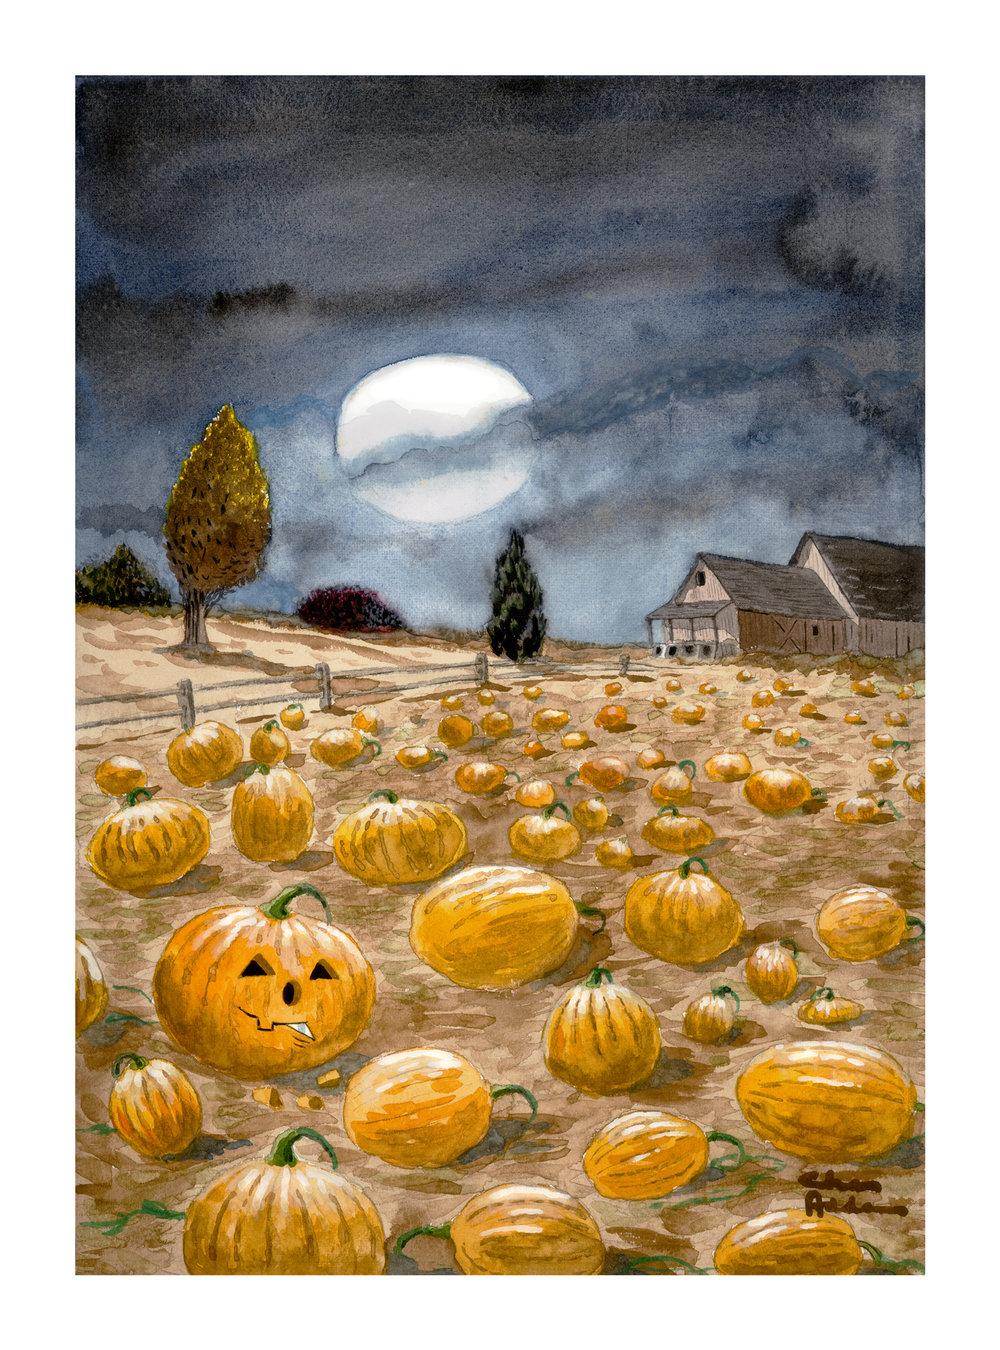 462-Self-CarvePumpkin.jpg